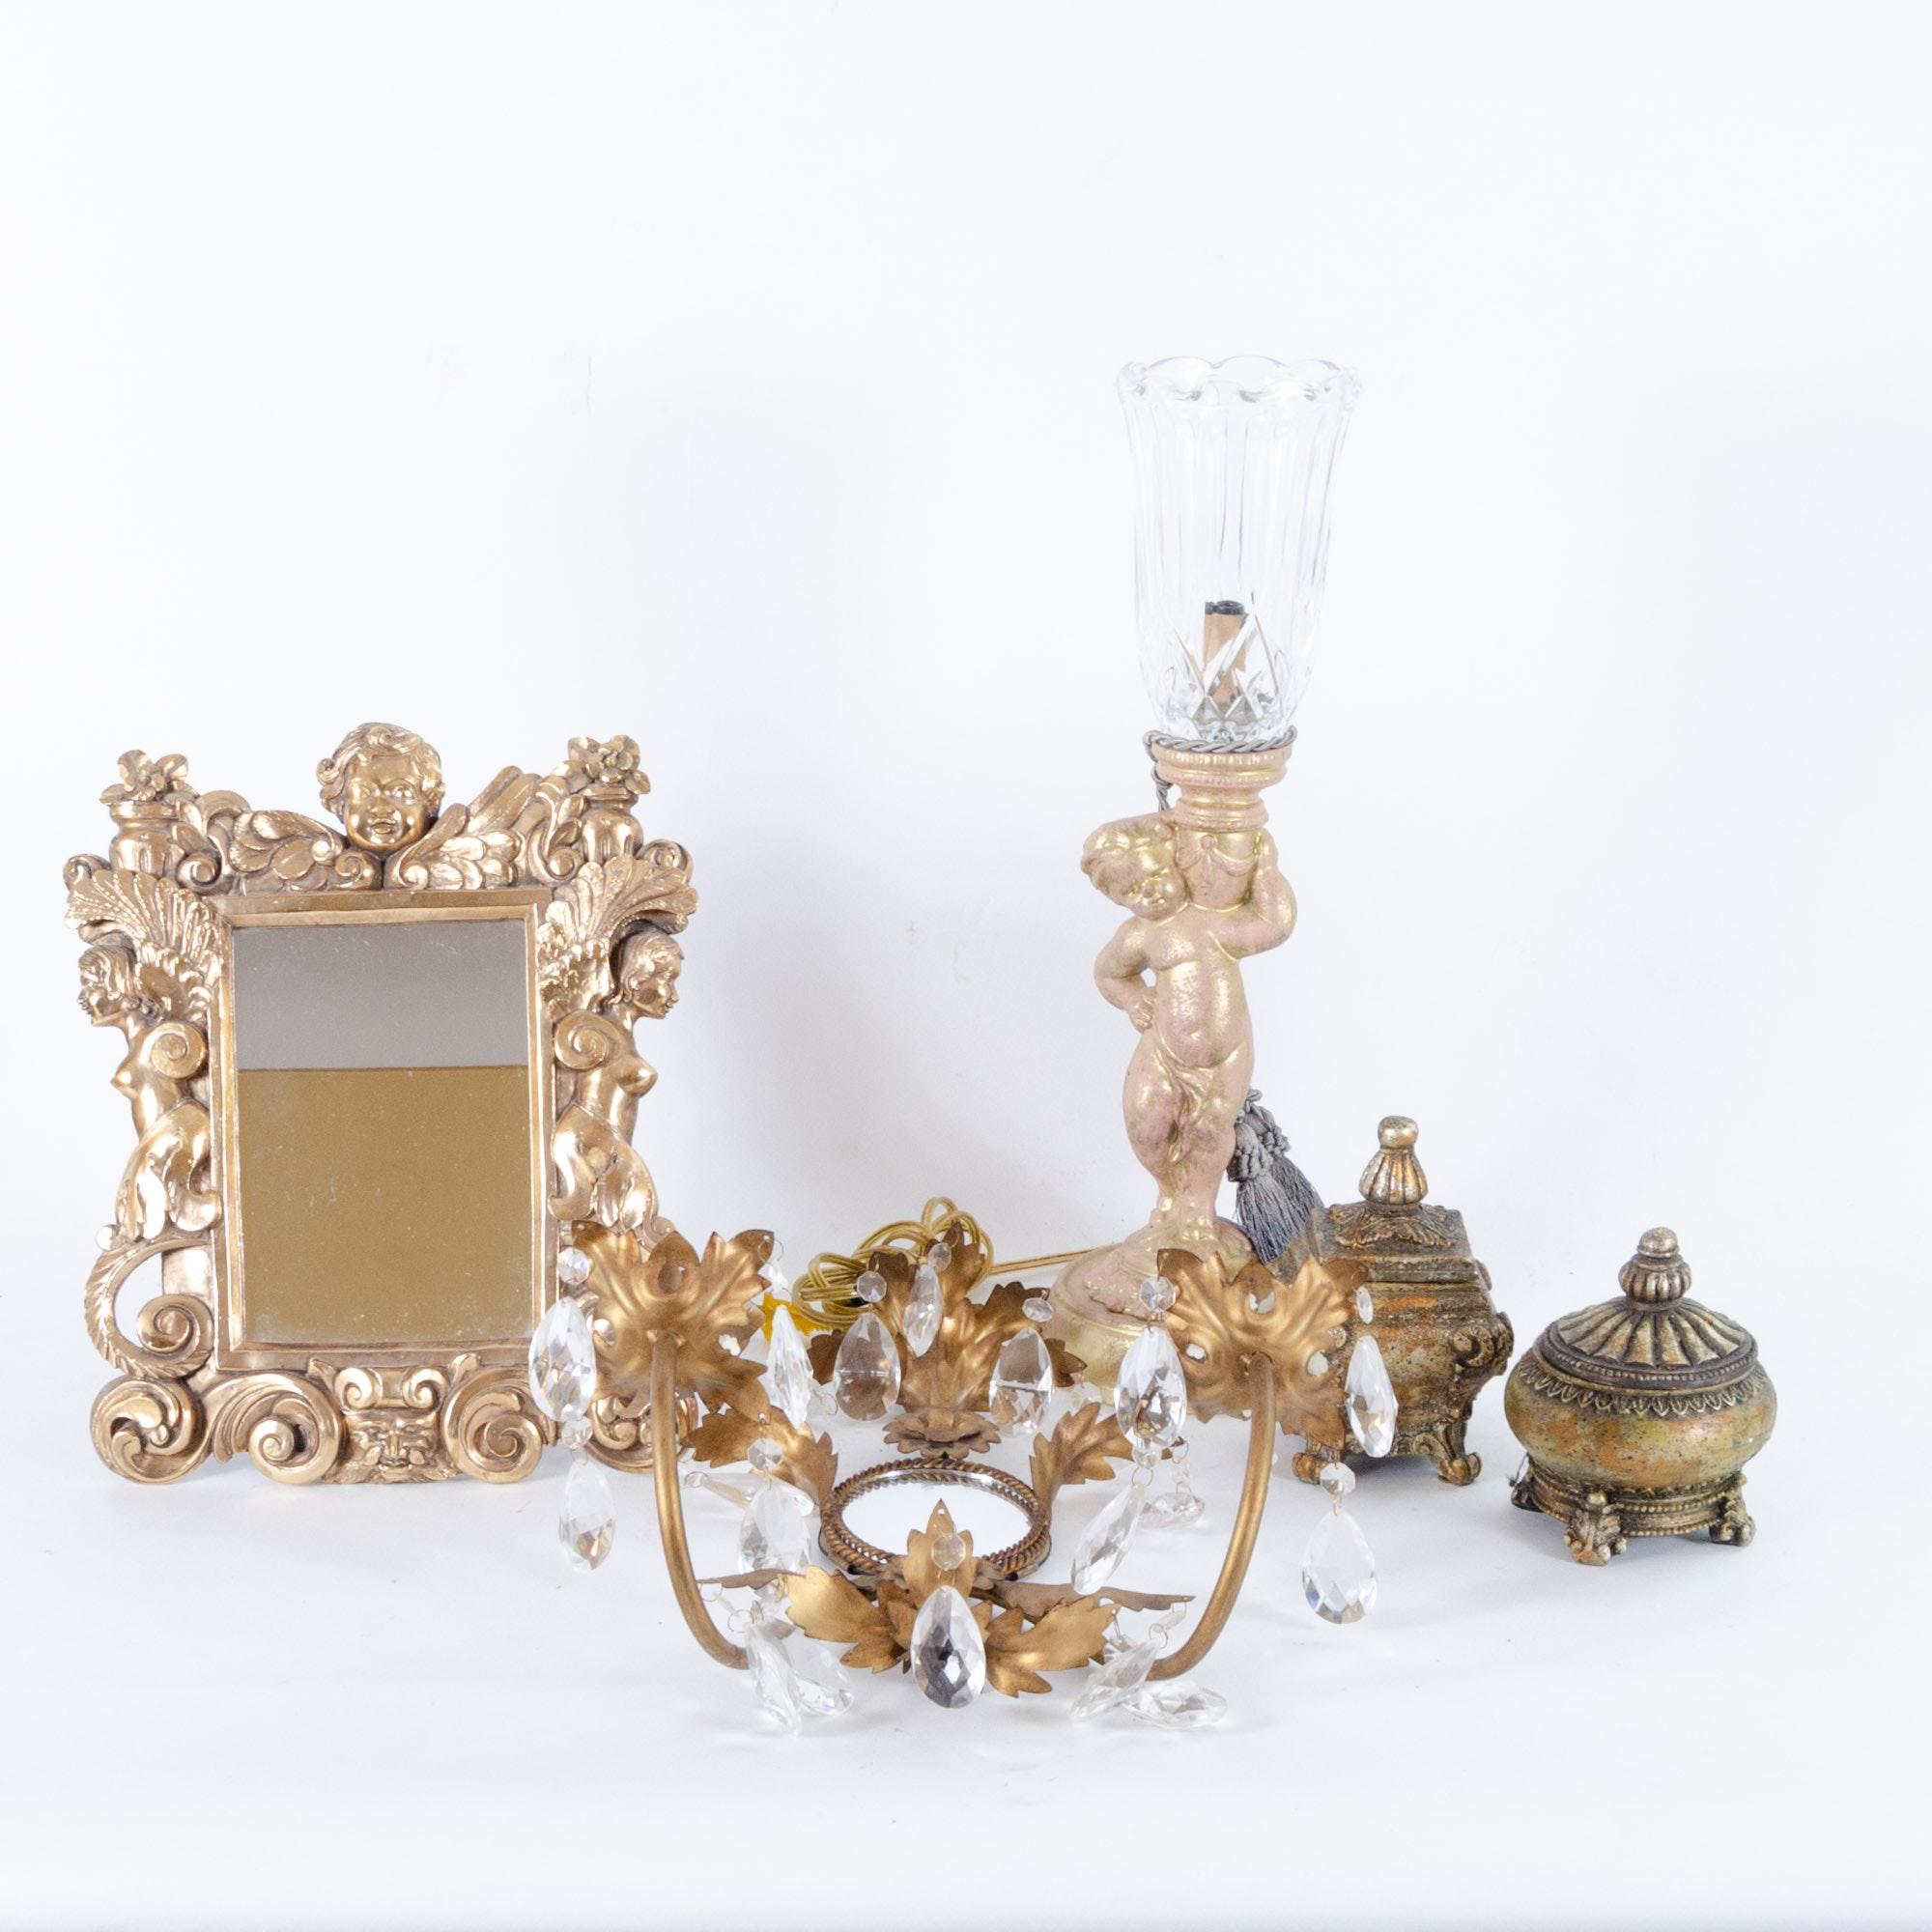 Baroque Style Gilt Wall Mirror and Decor